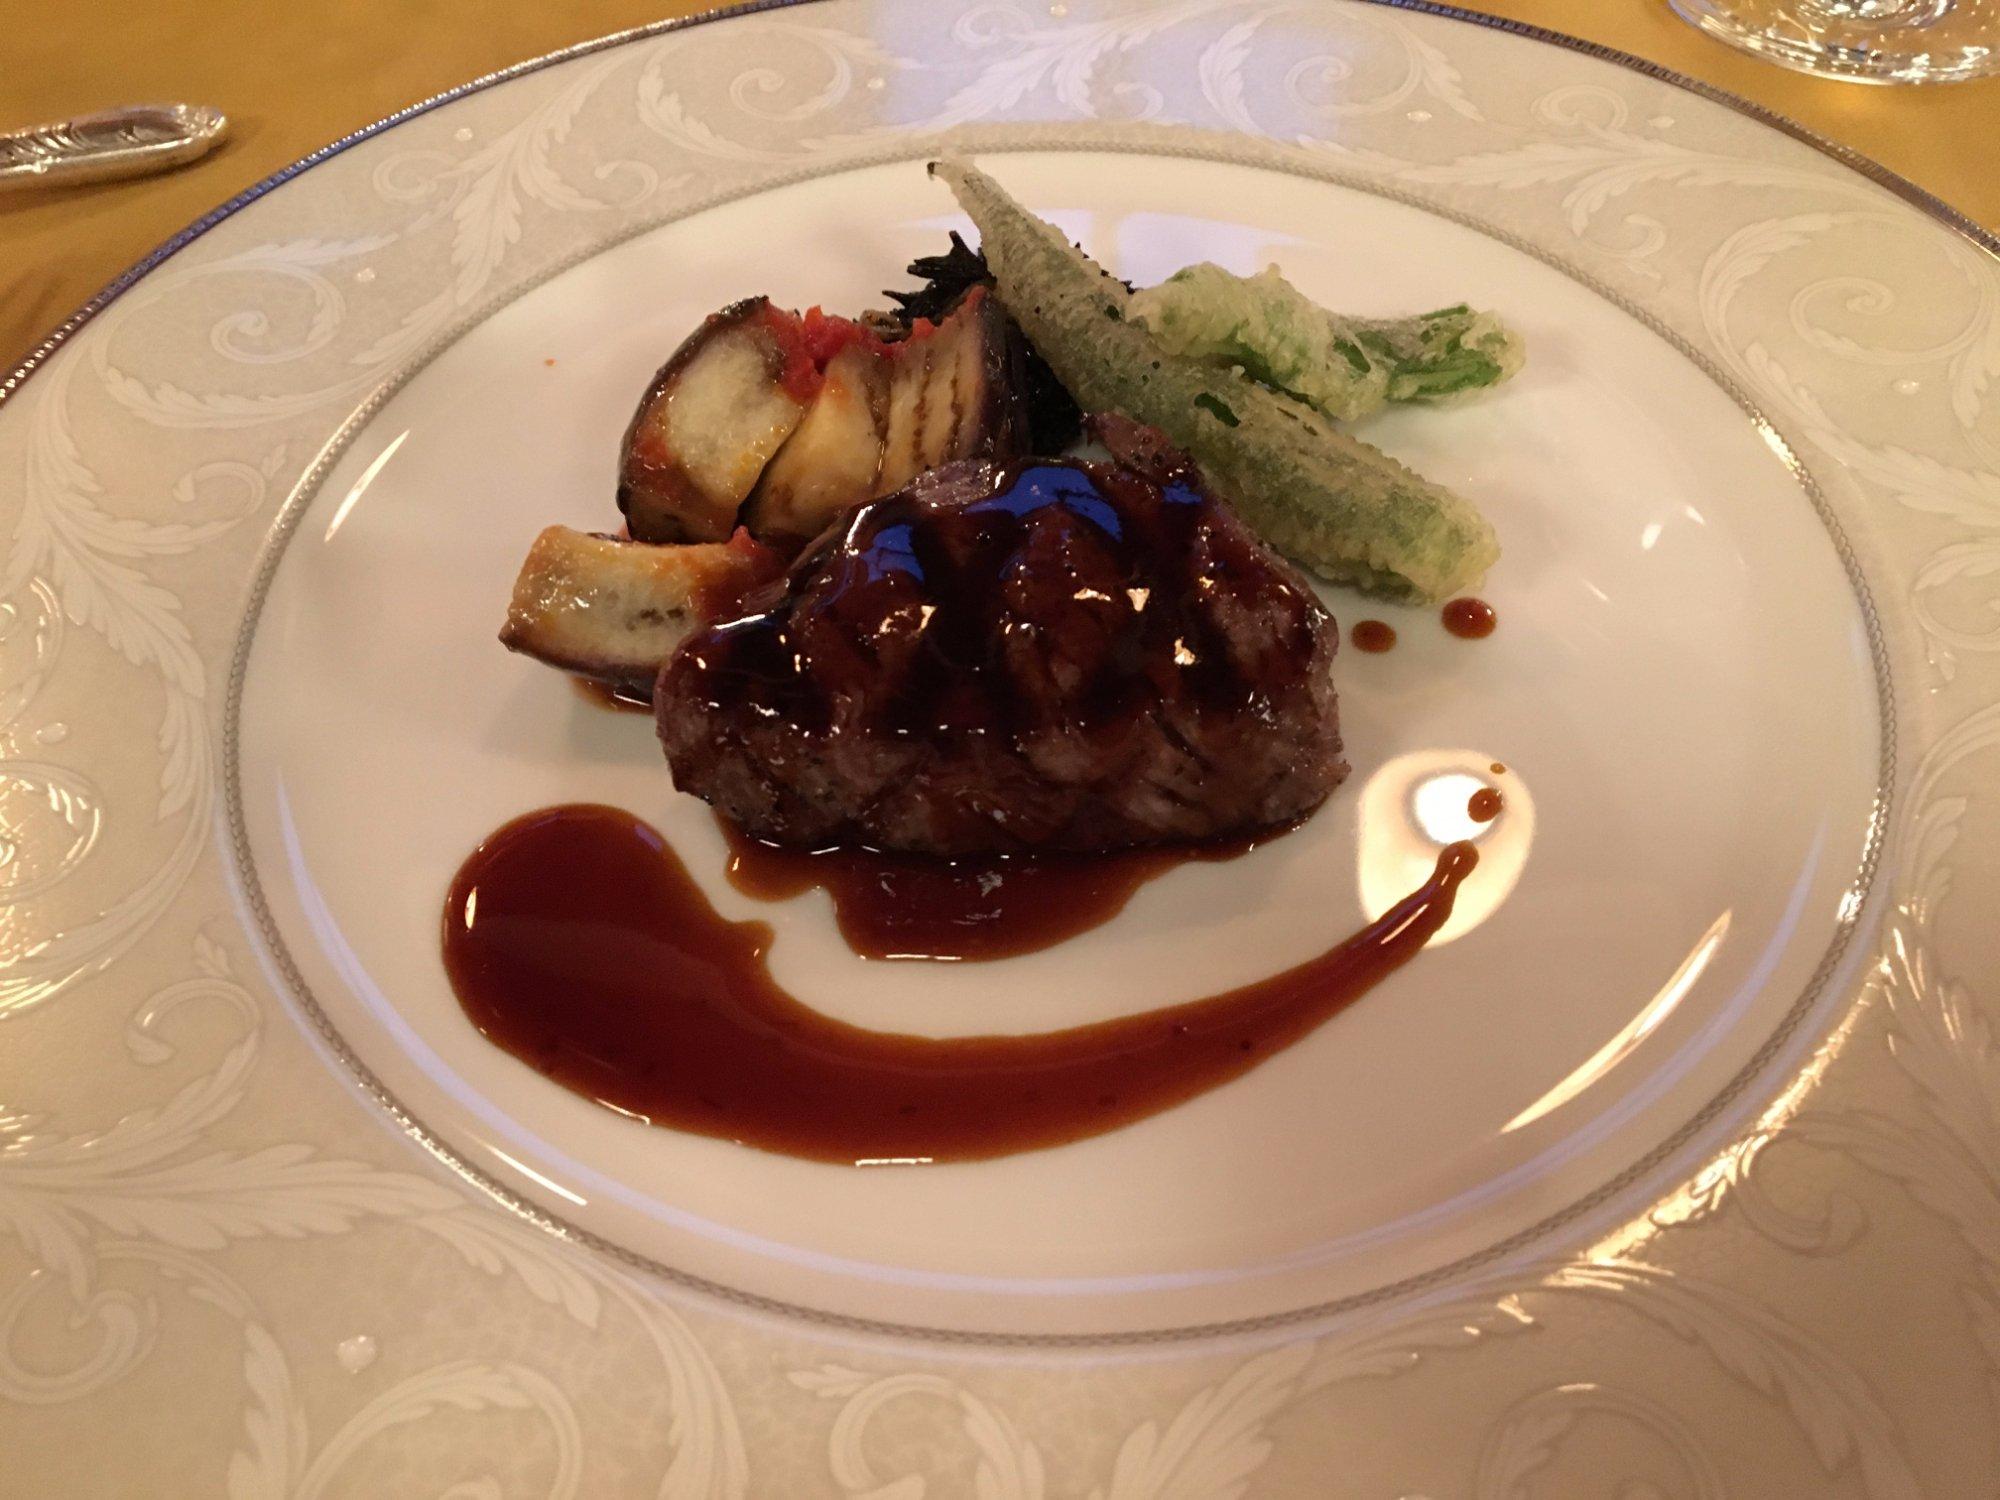 Nagano Prefecture, Japan Food Guide: 10 French food Must-Eat Restaurants & Street Food Stalls in Karuizawa-machi